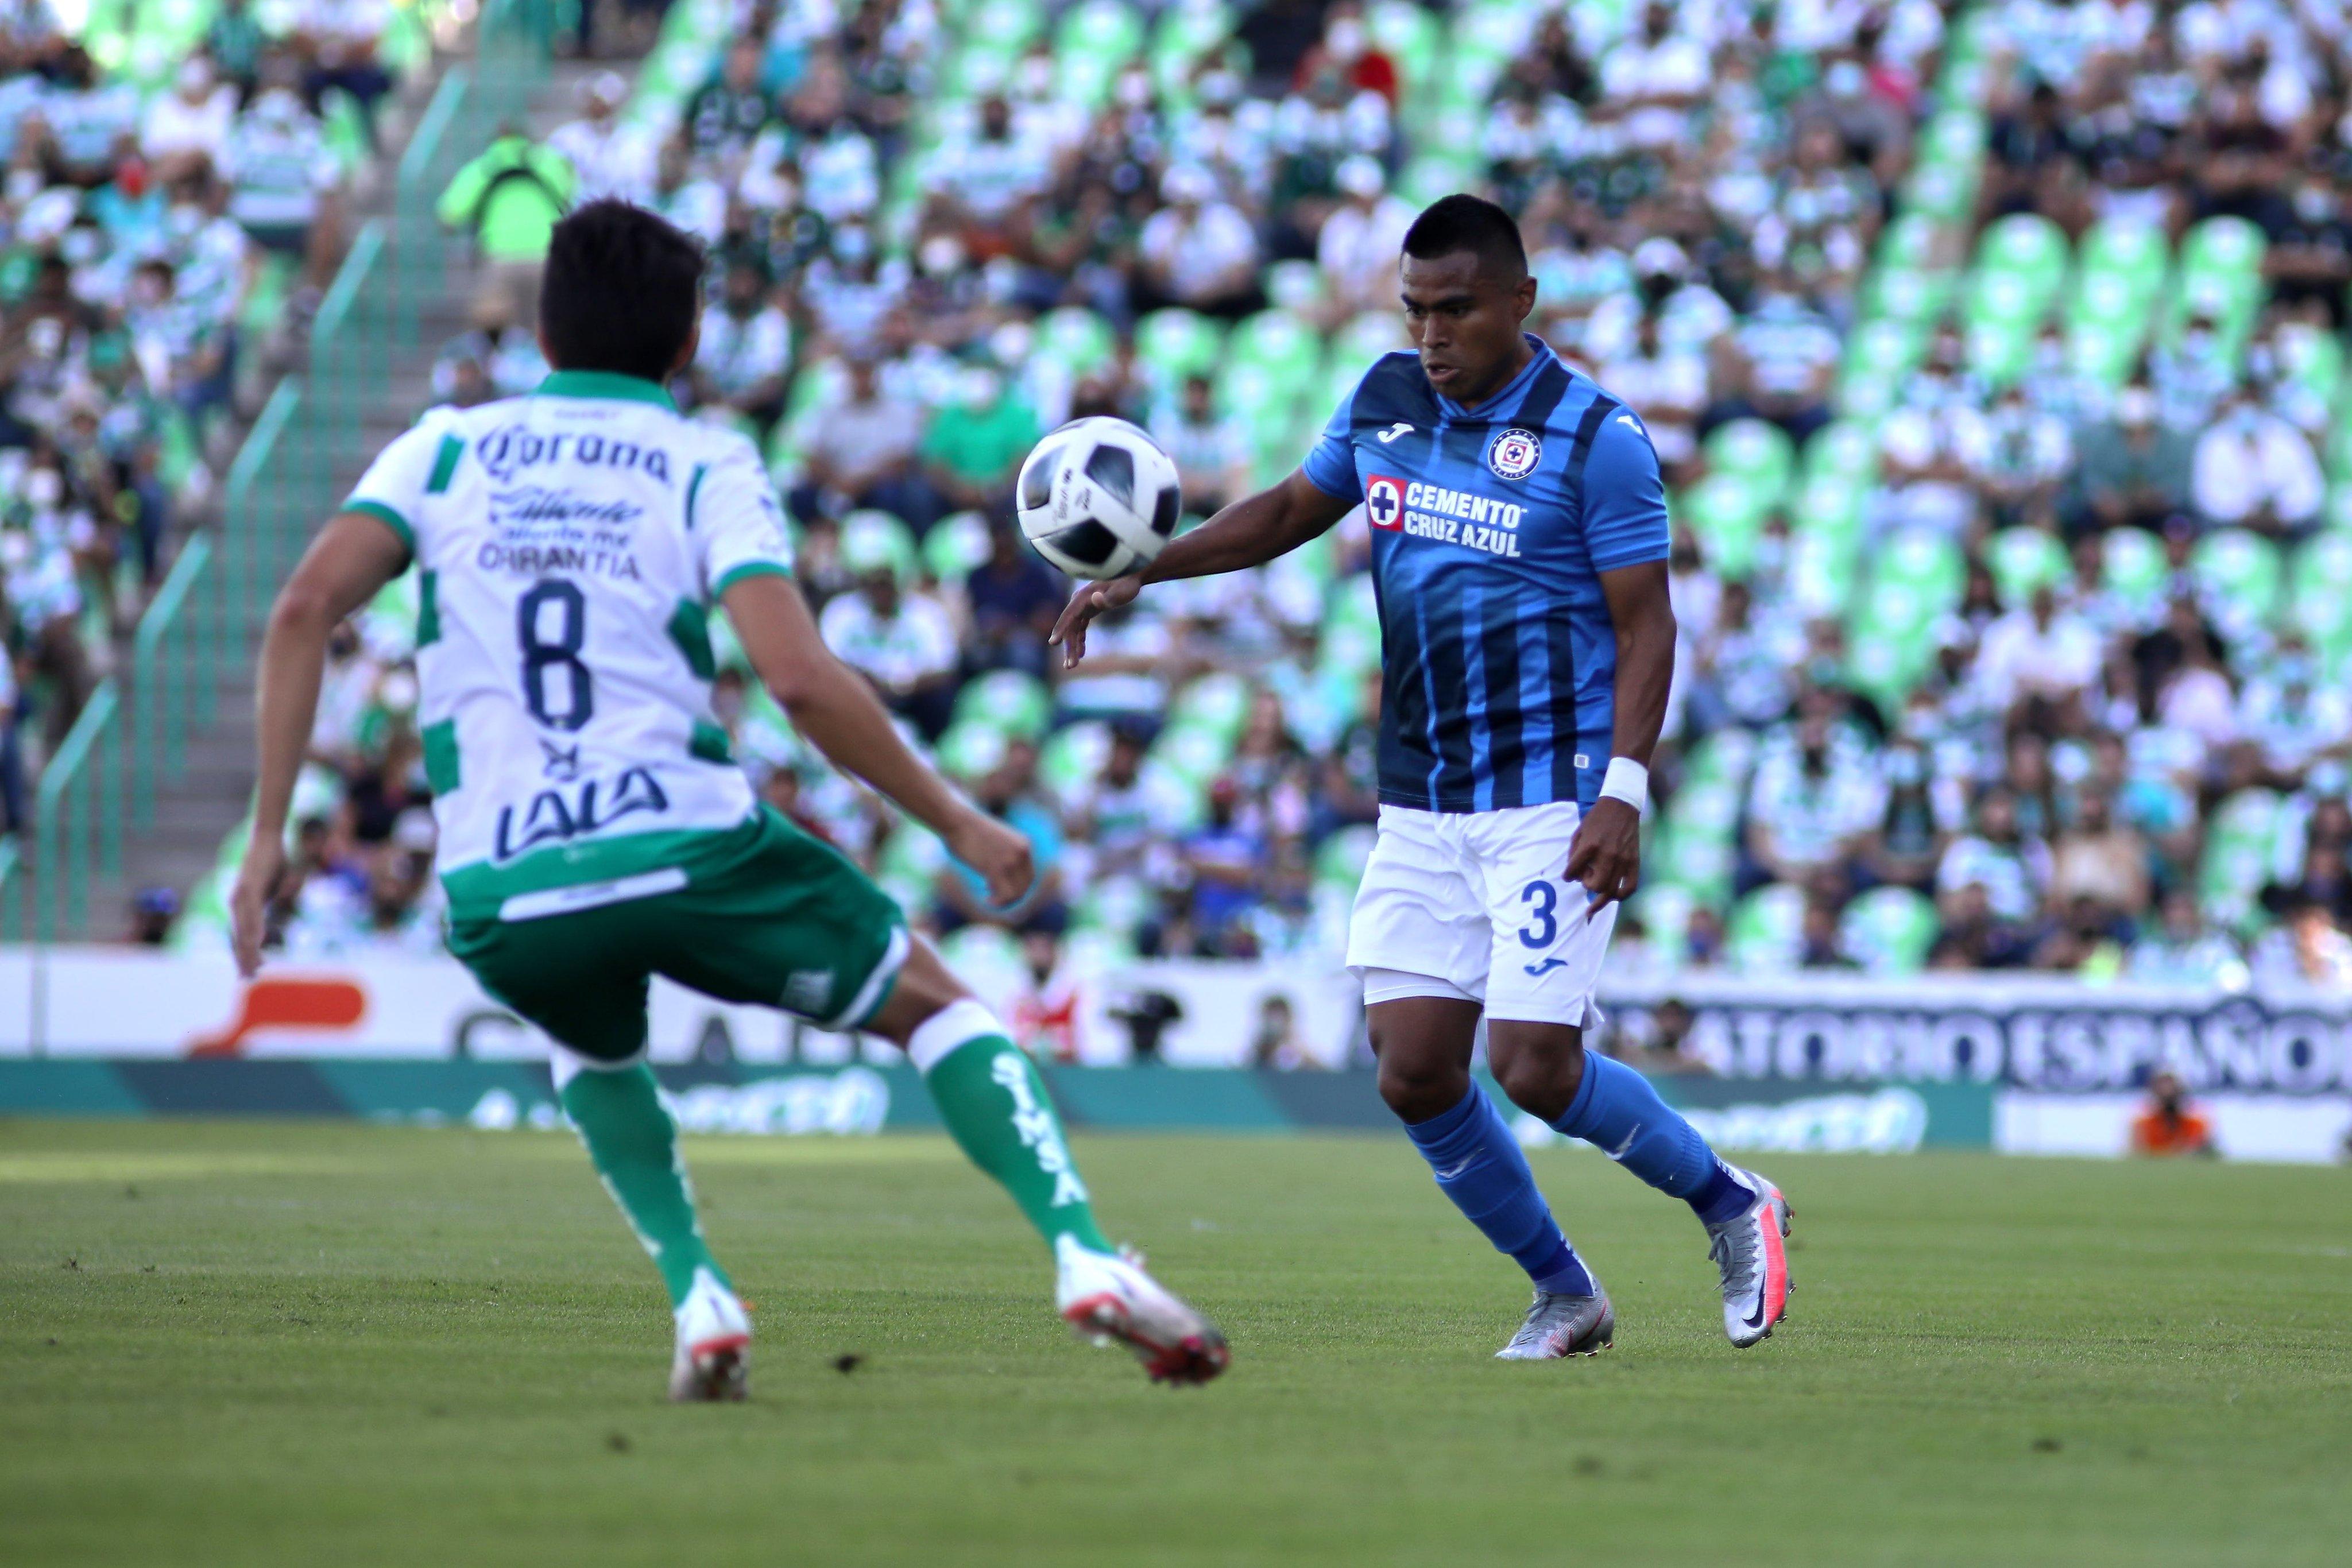 Santos 1-1 Cruz Azul